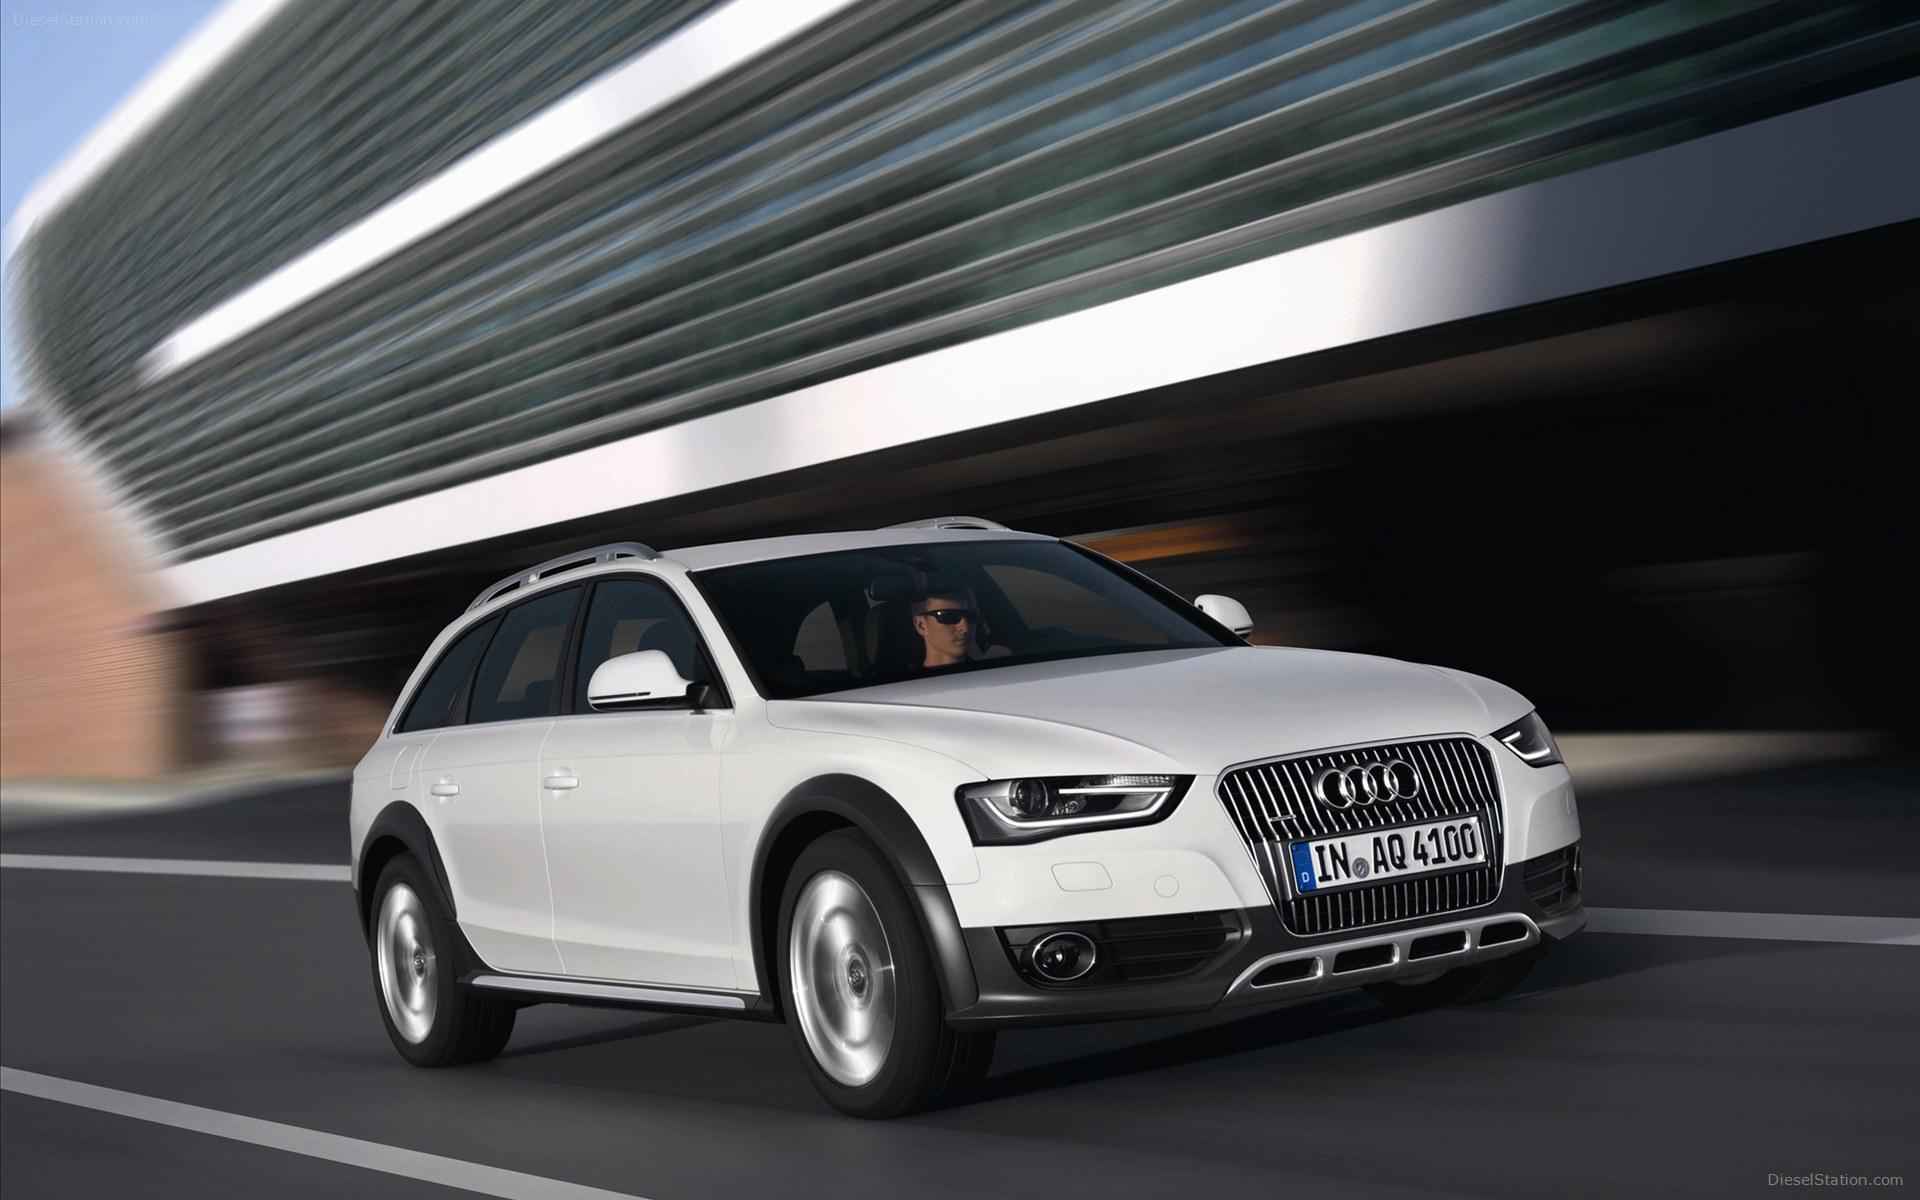 Audi A4 Allroad Quattro HD Wallpapers Luxury widescreen